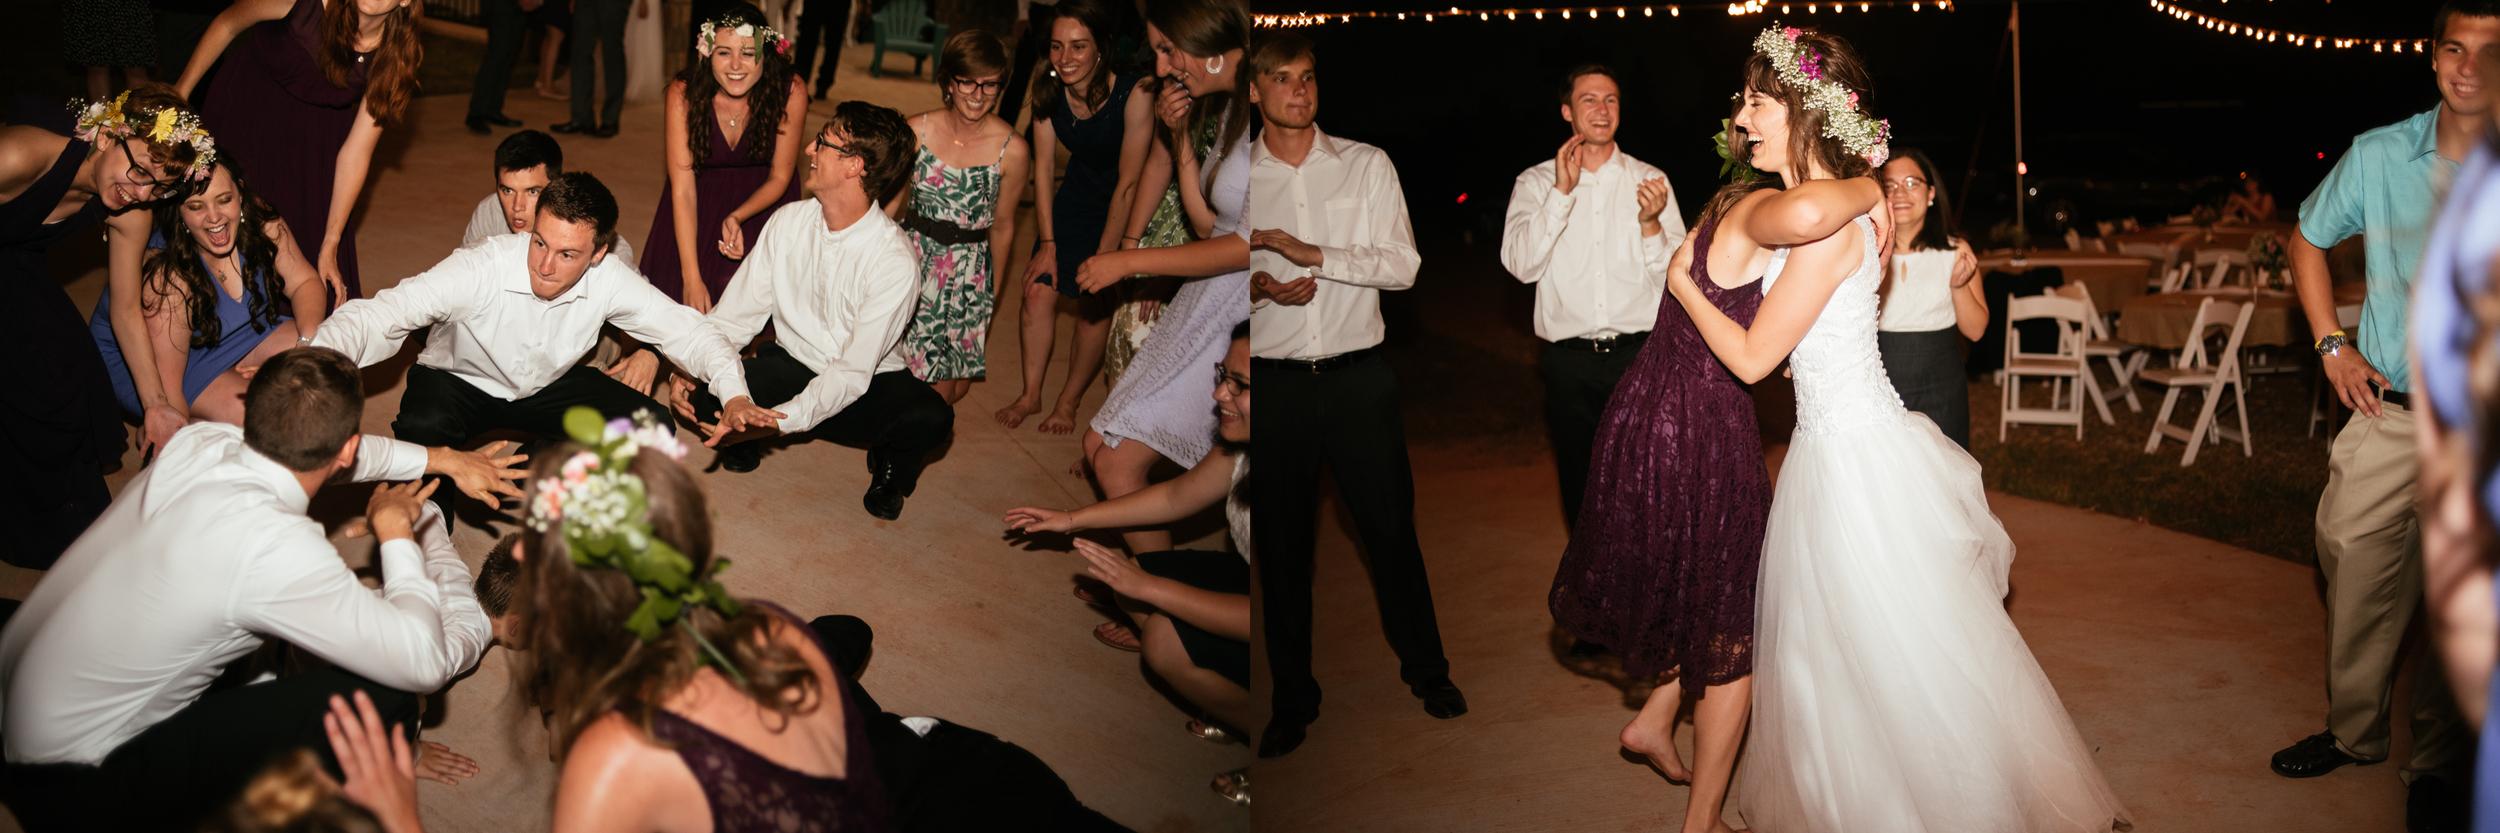 McCurrach Wedding24.jpg